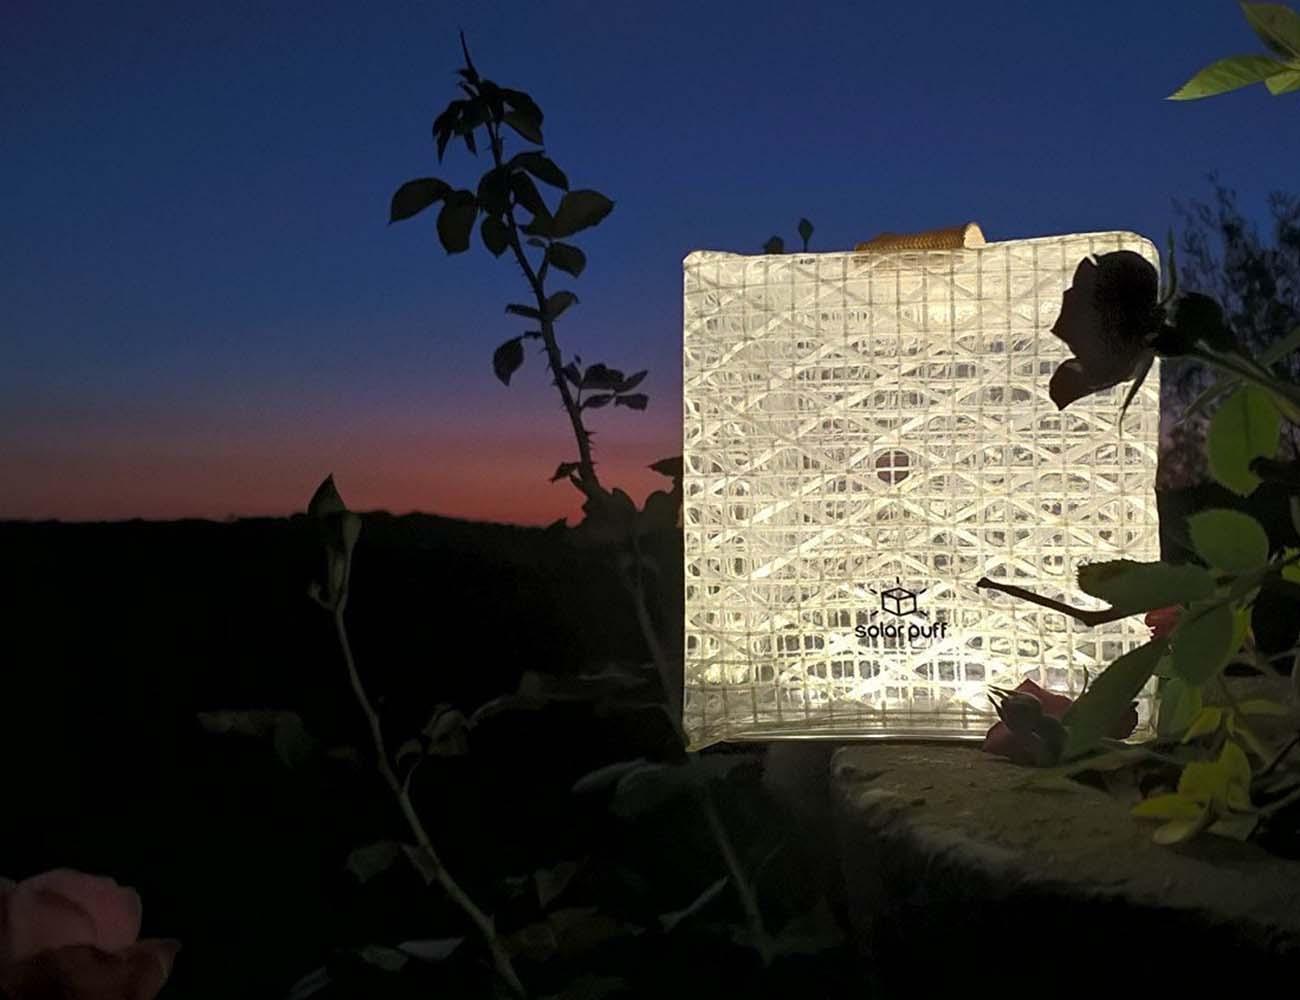 SolarPuff – Foldable Solar Lantern